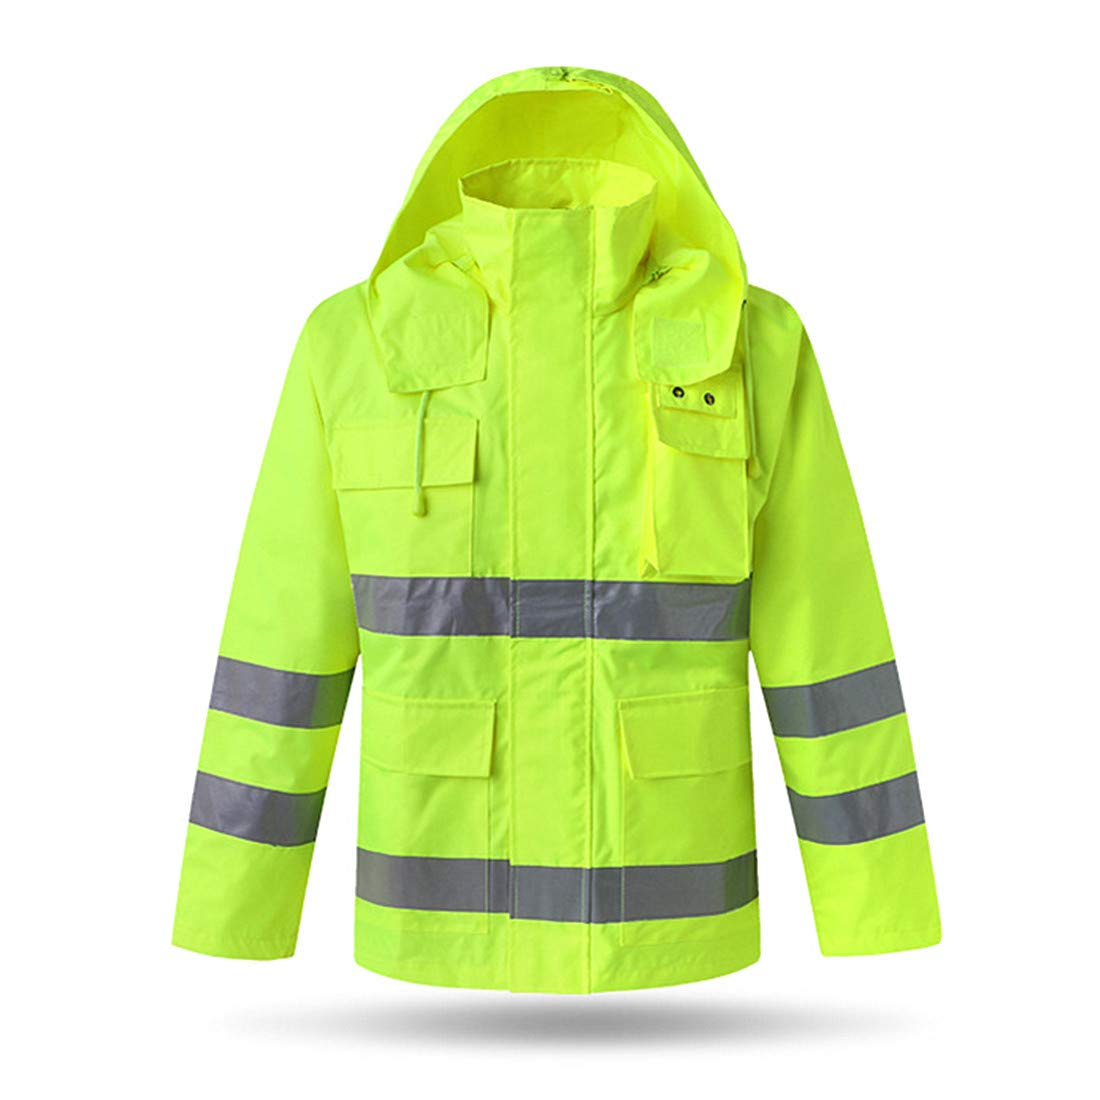 XIAKE SAFETY Class 3 Hi-Vis Reflective Rainwear Breathable Windproof Waterproof Antifouling, ANSI/ISEA Compliant,Yellow(Large)